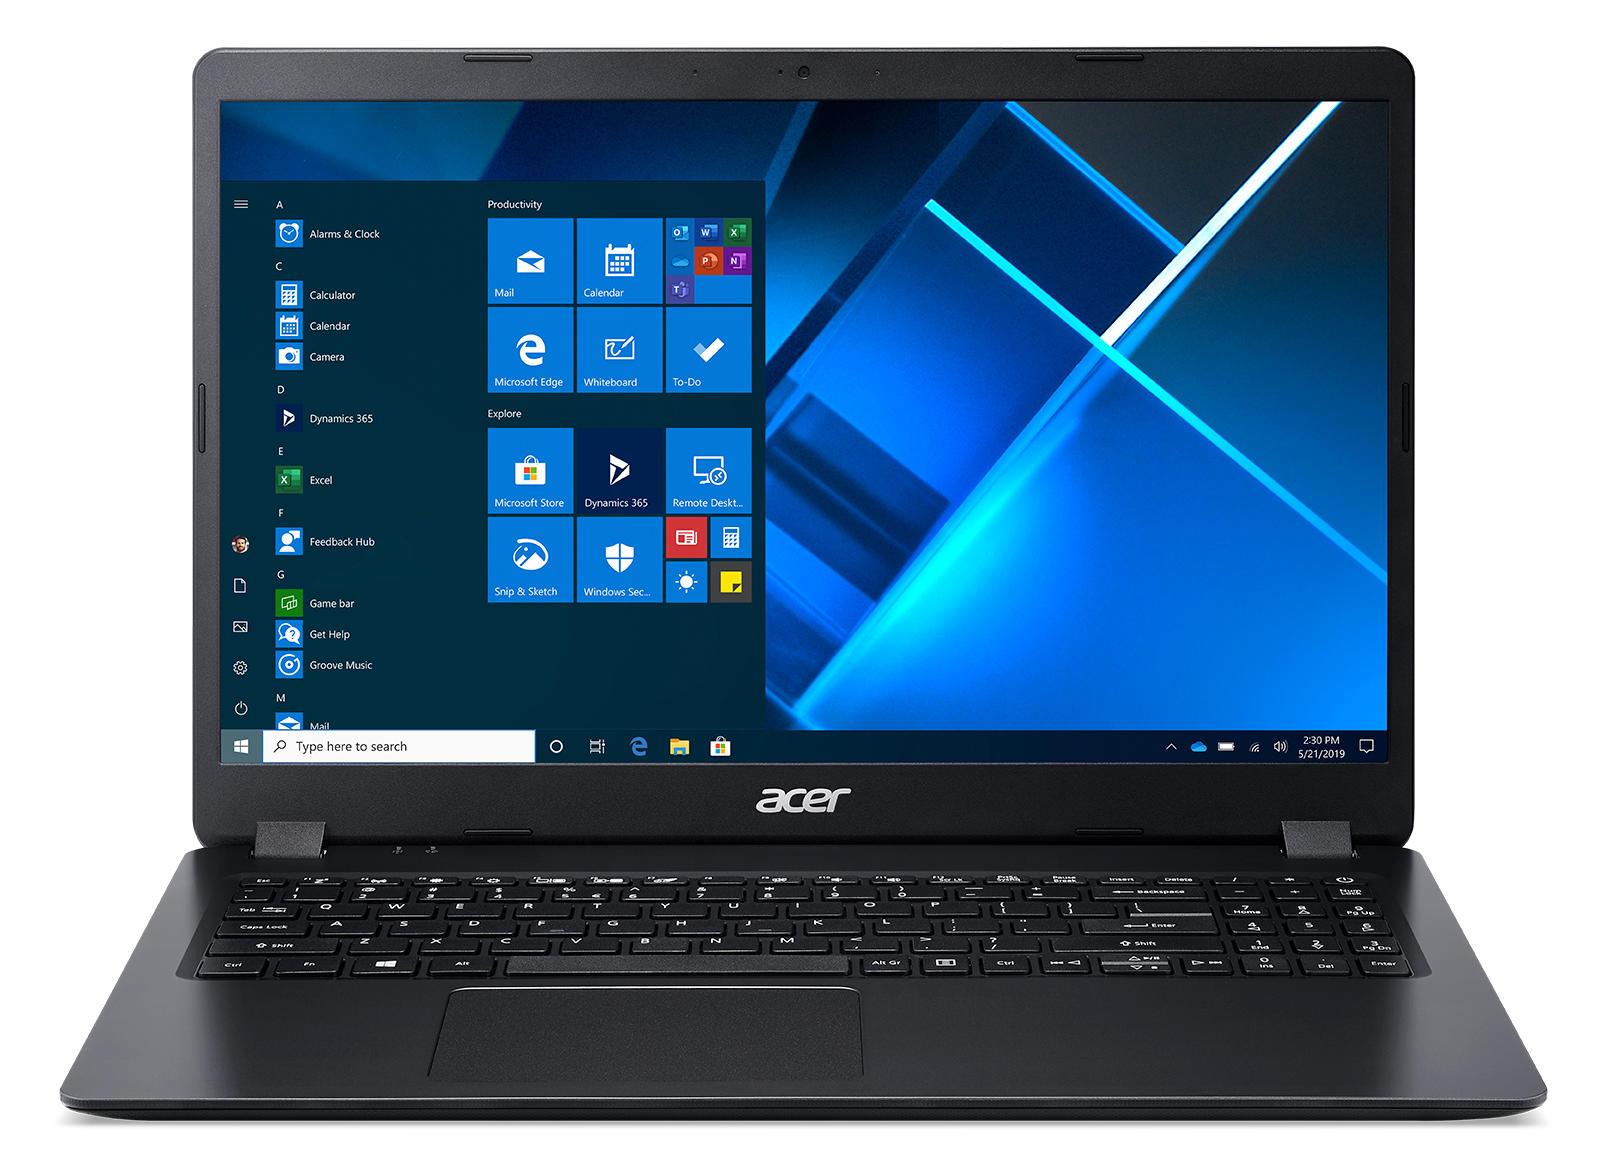 Acer Extensa 15 EX215-52-3528 laptop